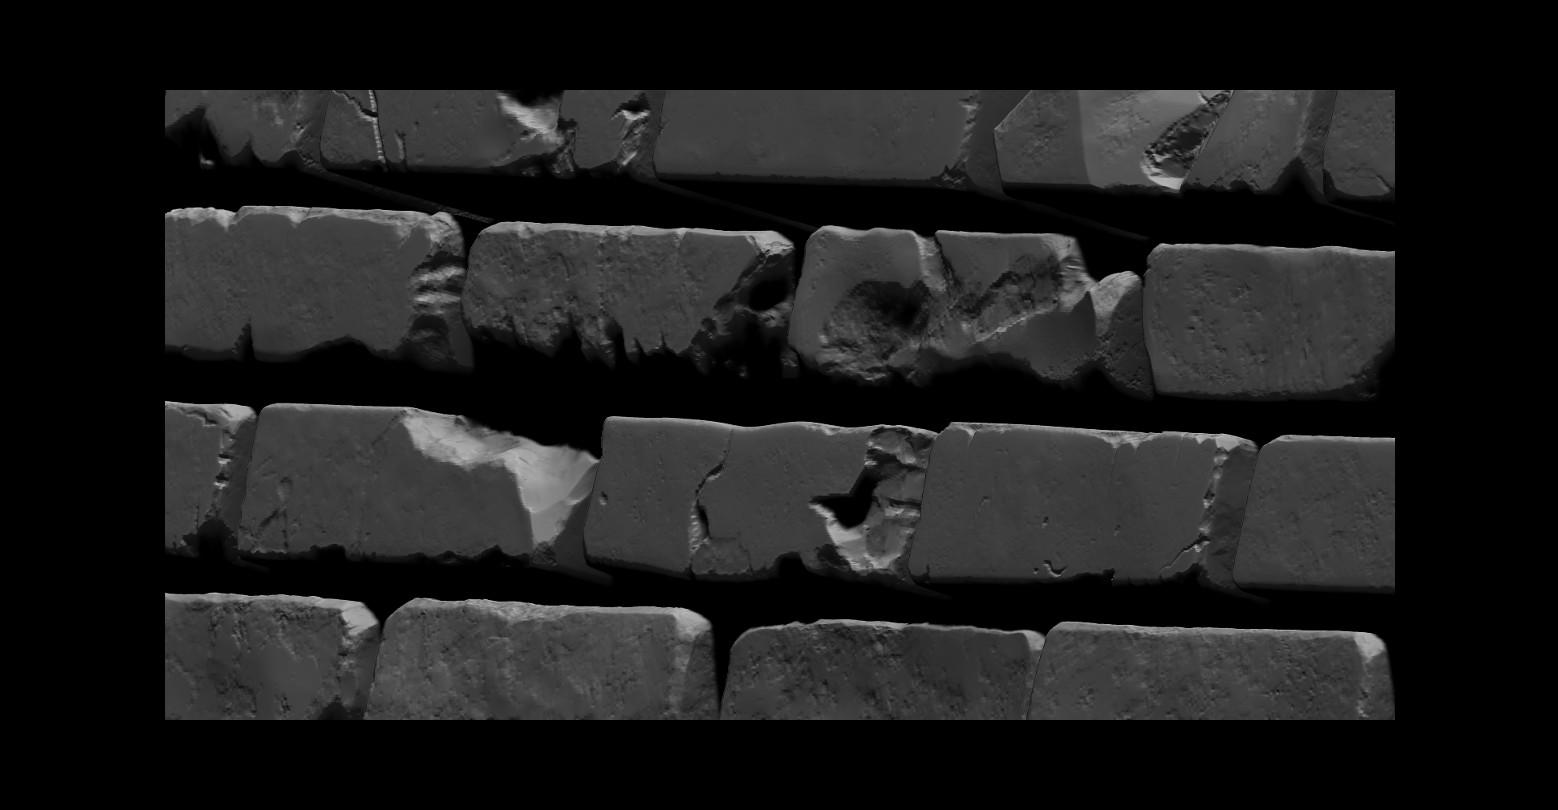 Bela csampai brick wall 01 render zb 06